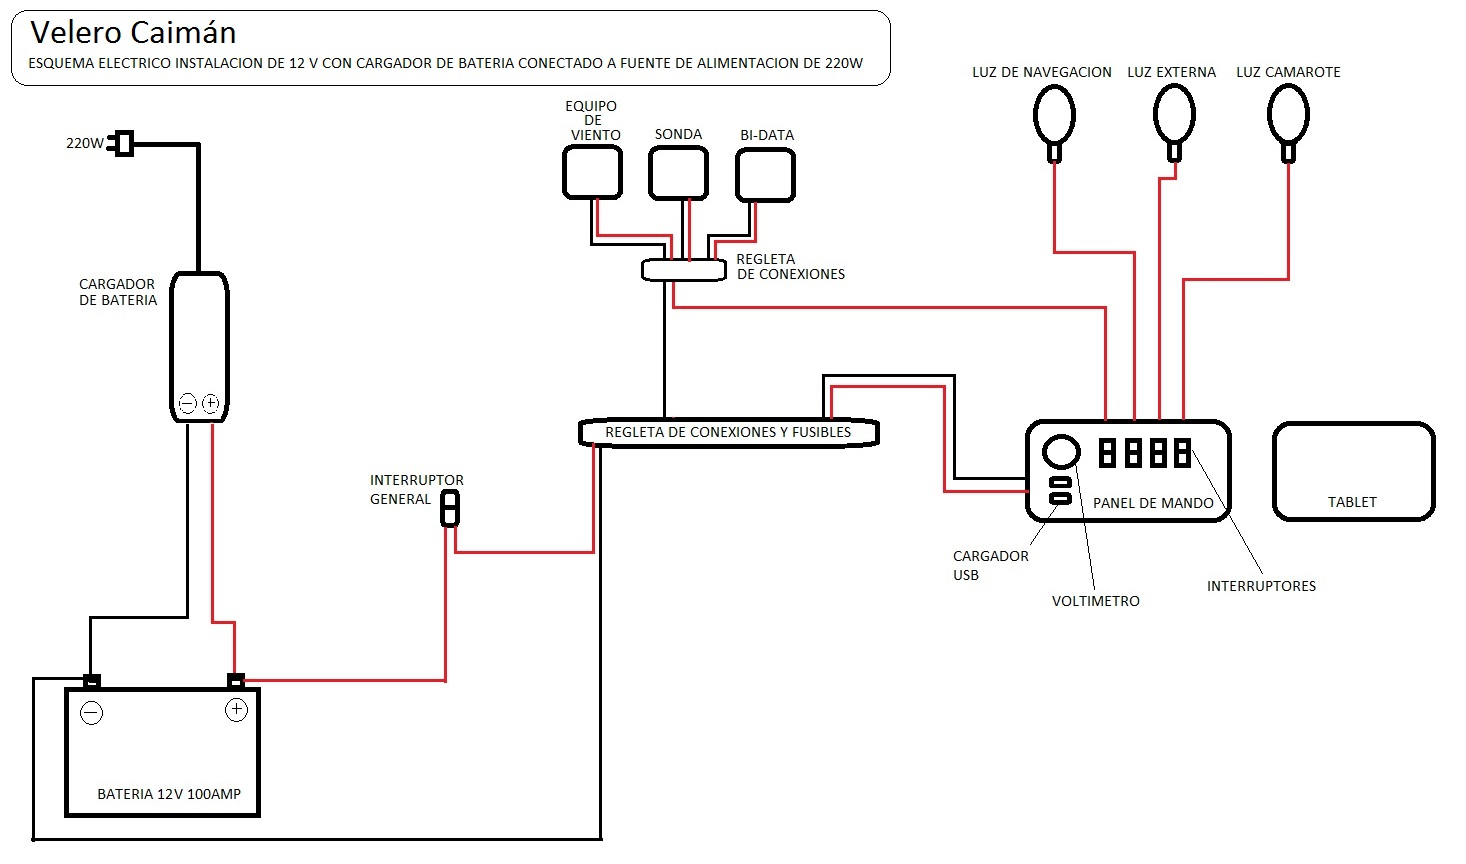 Circuito Electrico : Circuito electrico la taberna del puerto